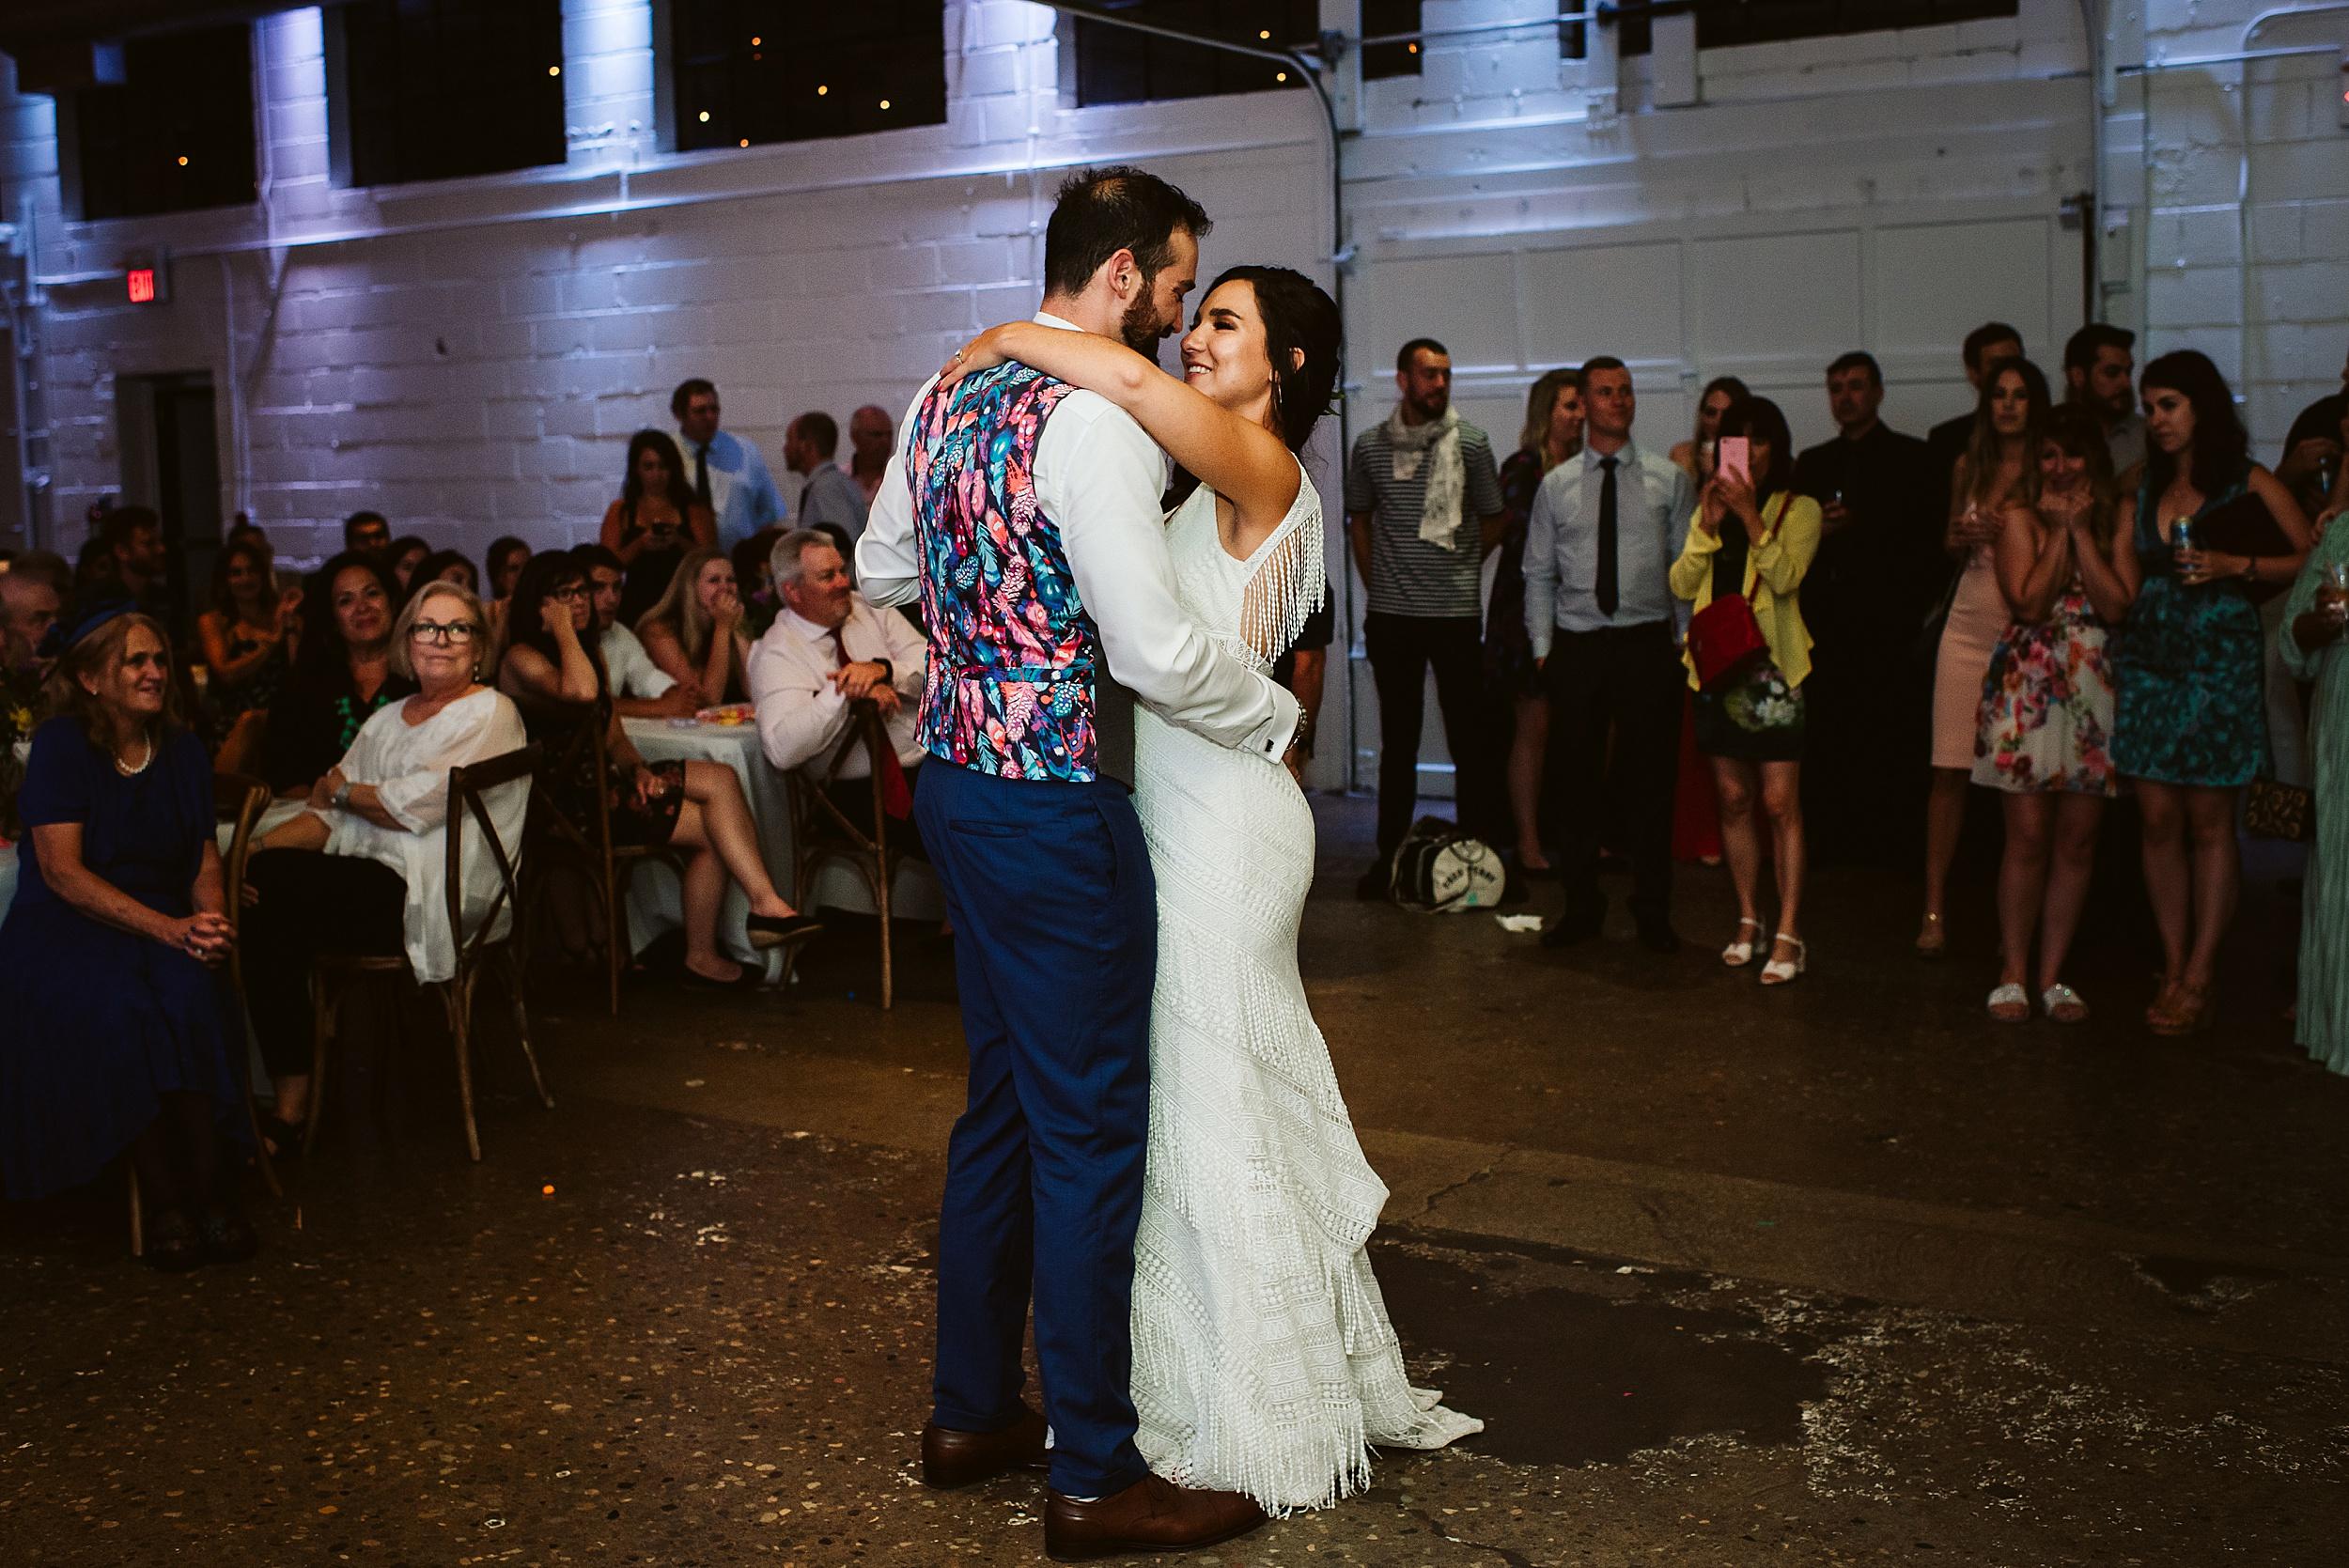 Airship-37-Berkeley-Events-Distillery-District-Wedding-Toronto-Wedding-Photographers_0095.jpg